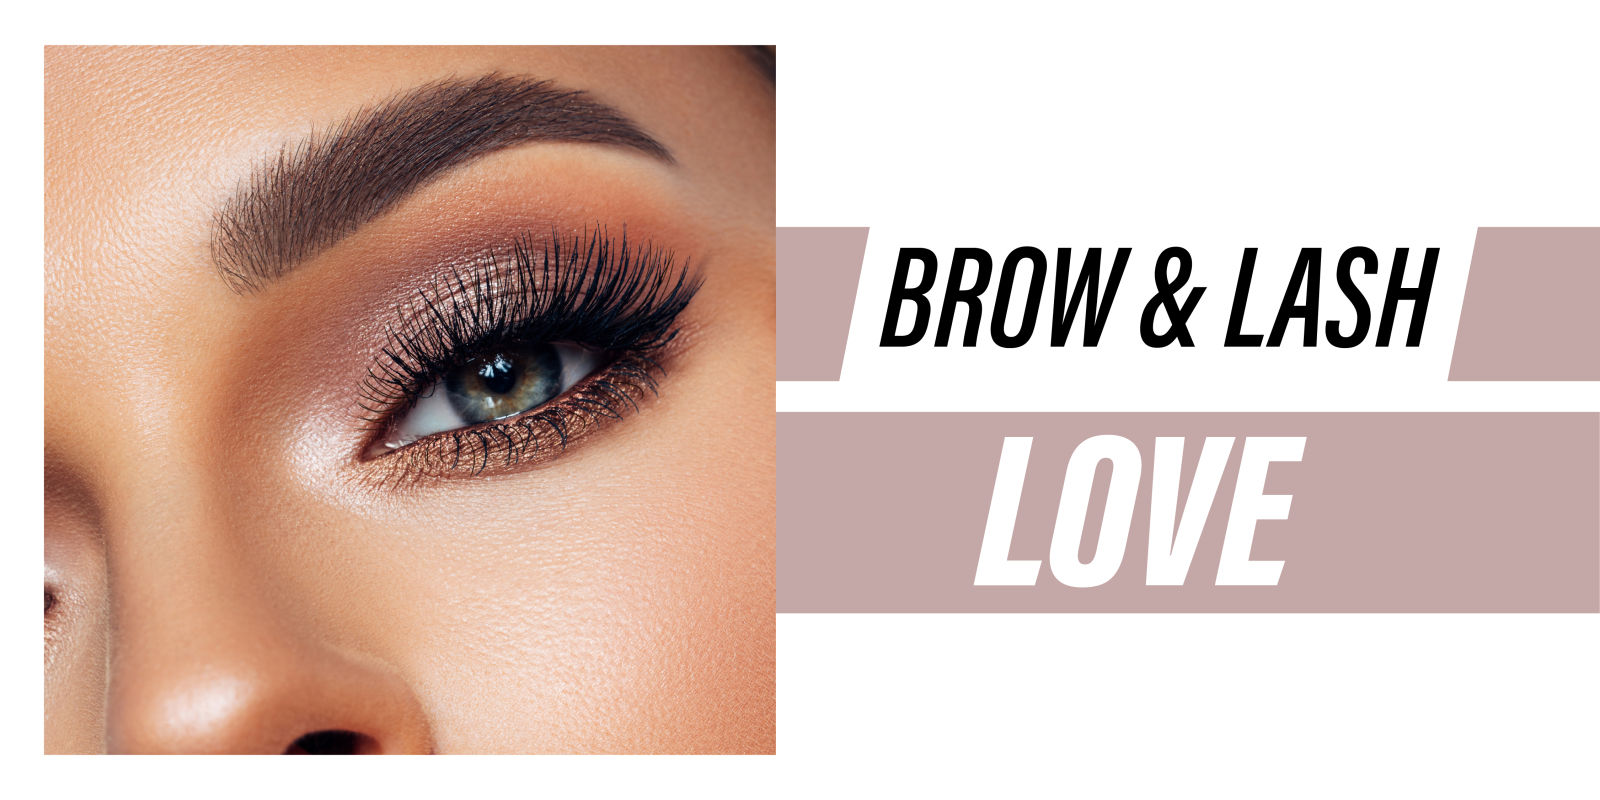 [Image] [offer] Brow & Lash Love Promotion